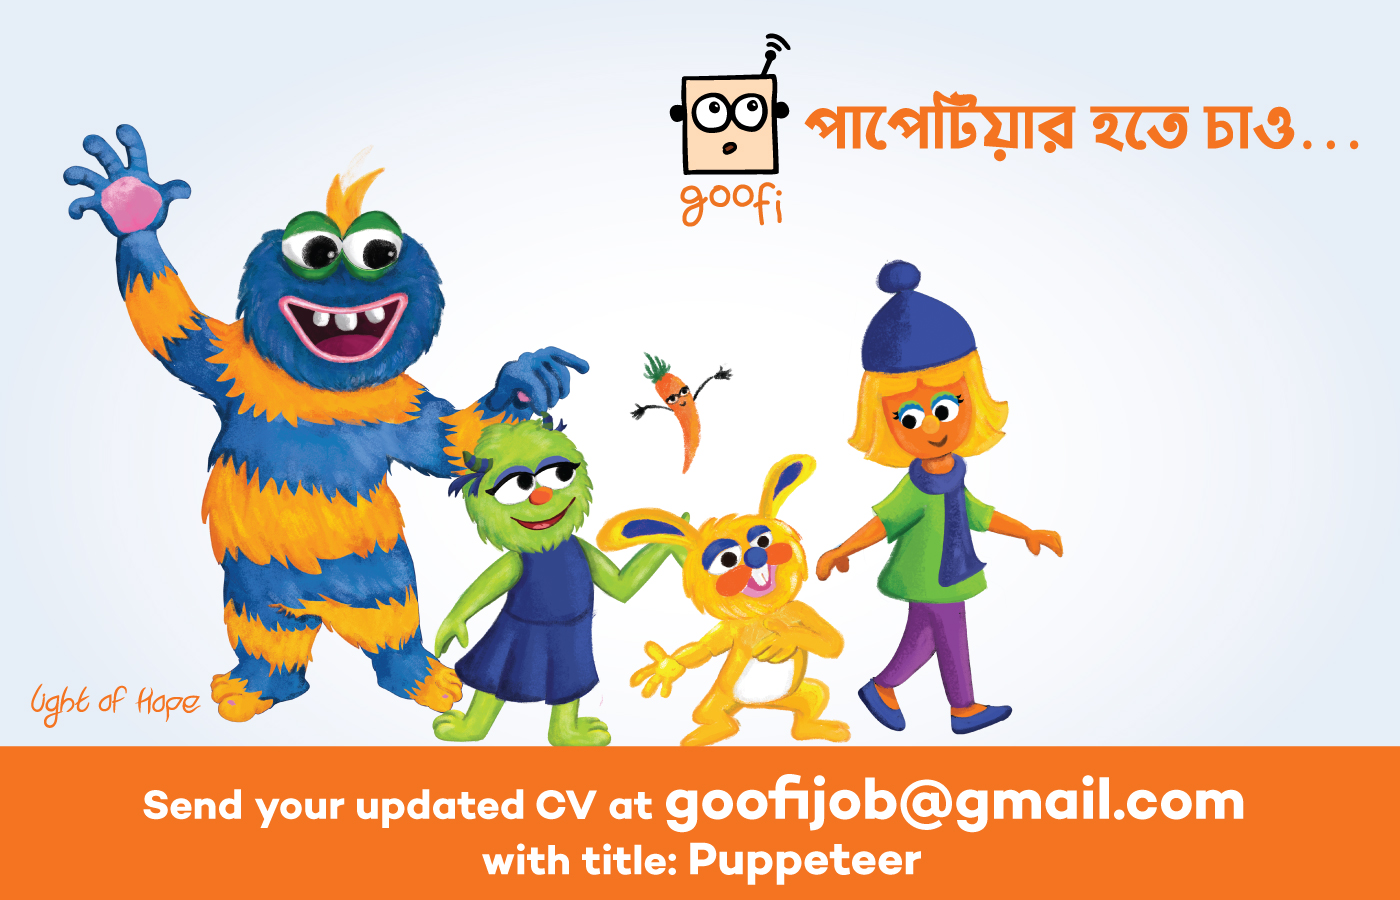 Goofi is hiring Puppeteer